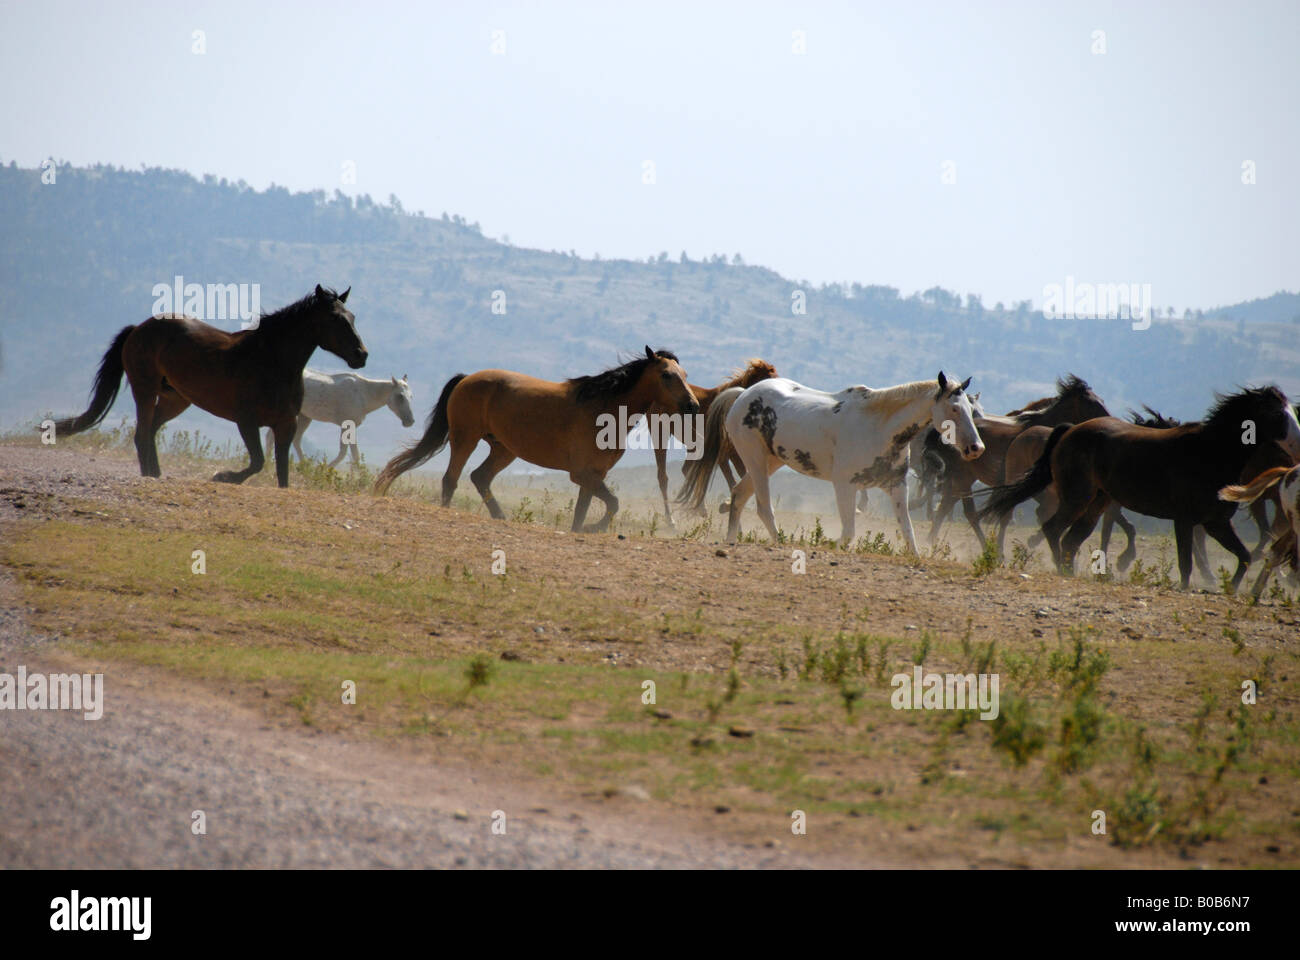 North America Usa South Dakota Black Hills Wild Horse Sanctuary Stock Photo Alamy